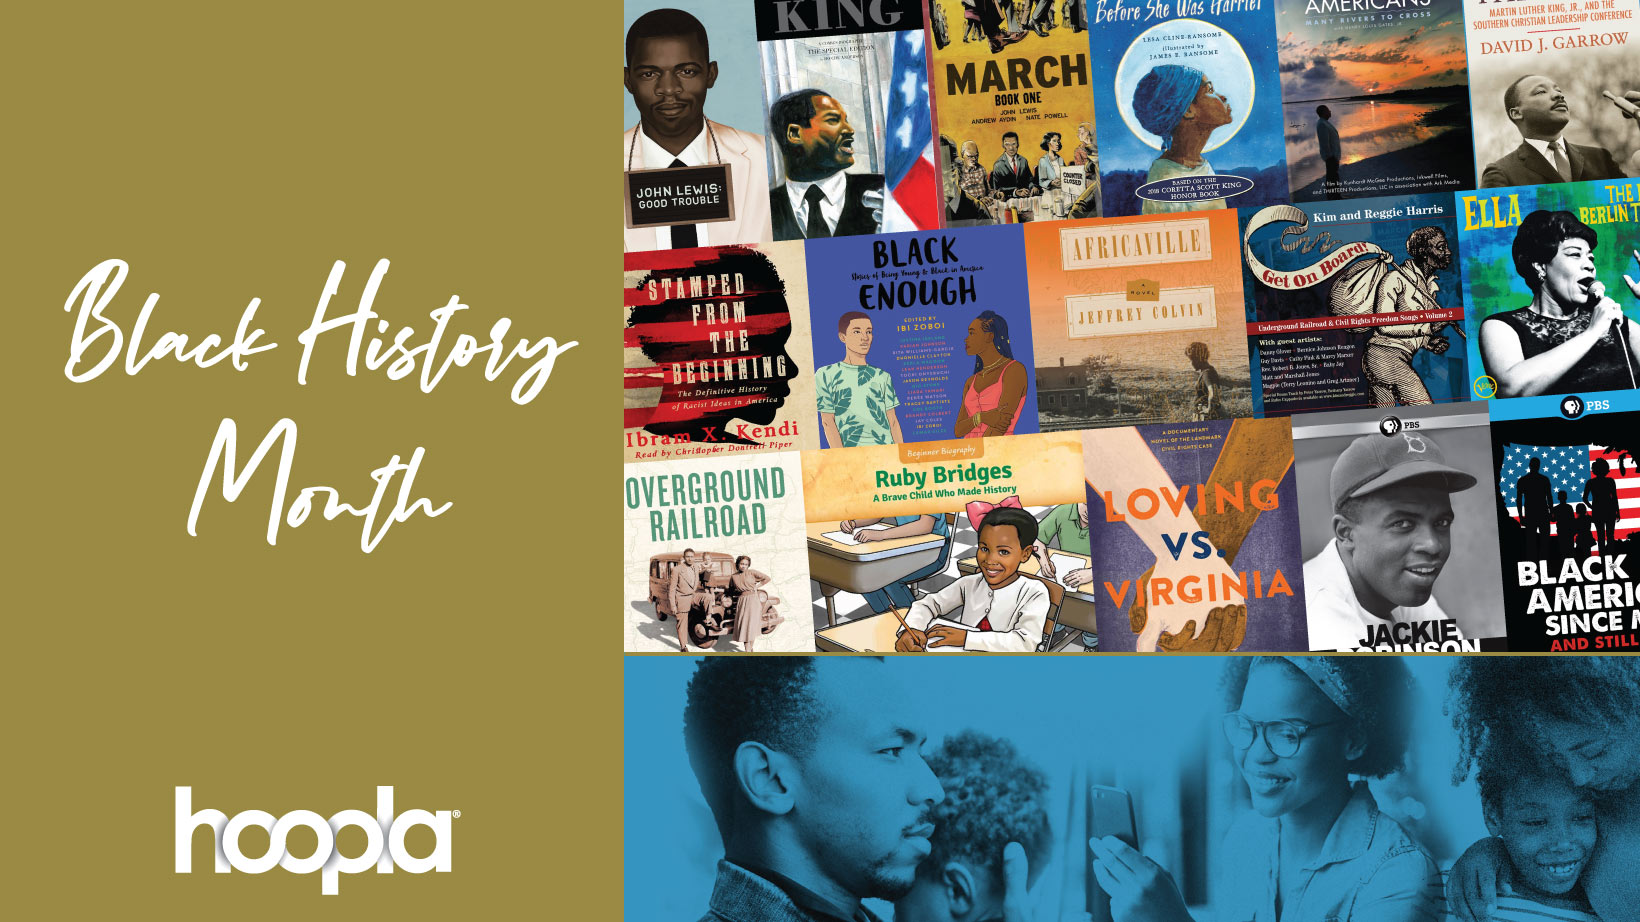 hoopla black history month titles